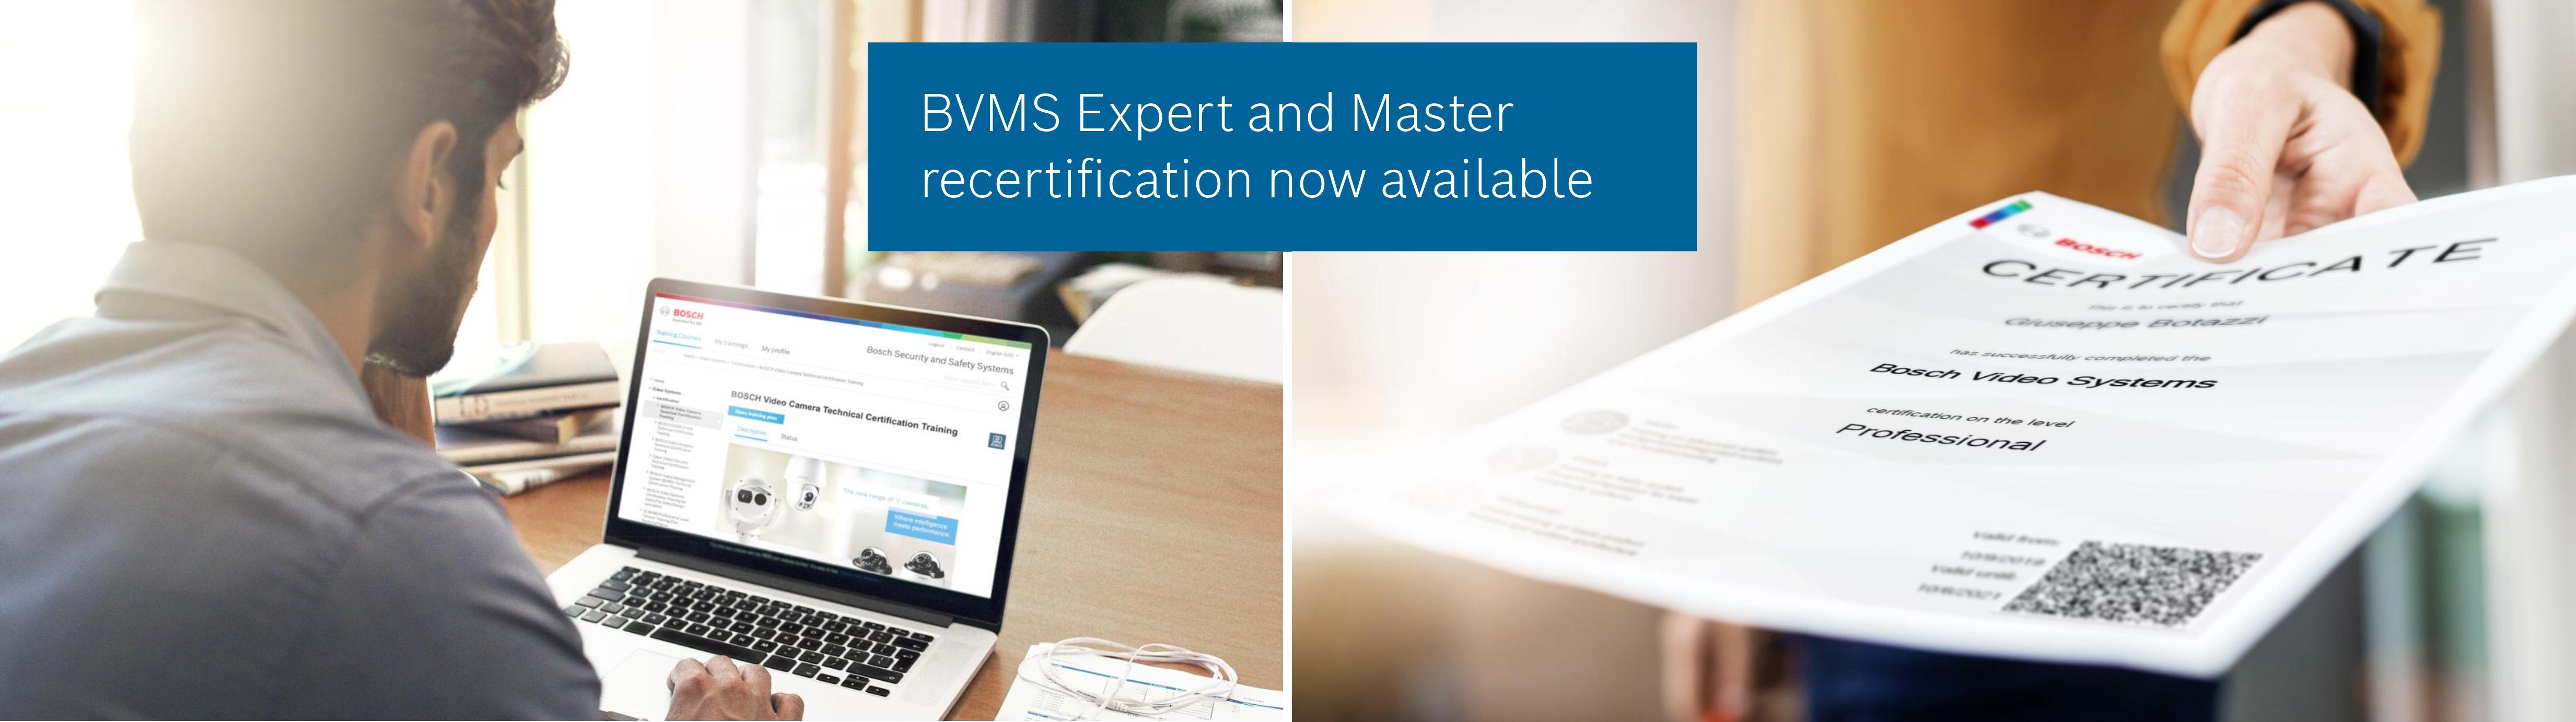 BVMS Recertification image